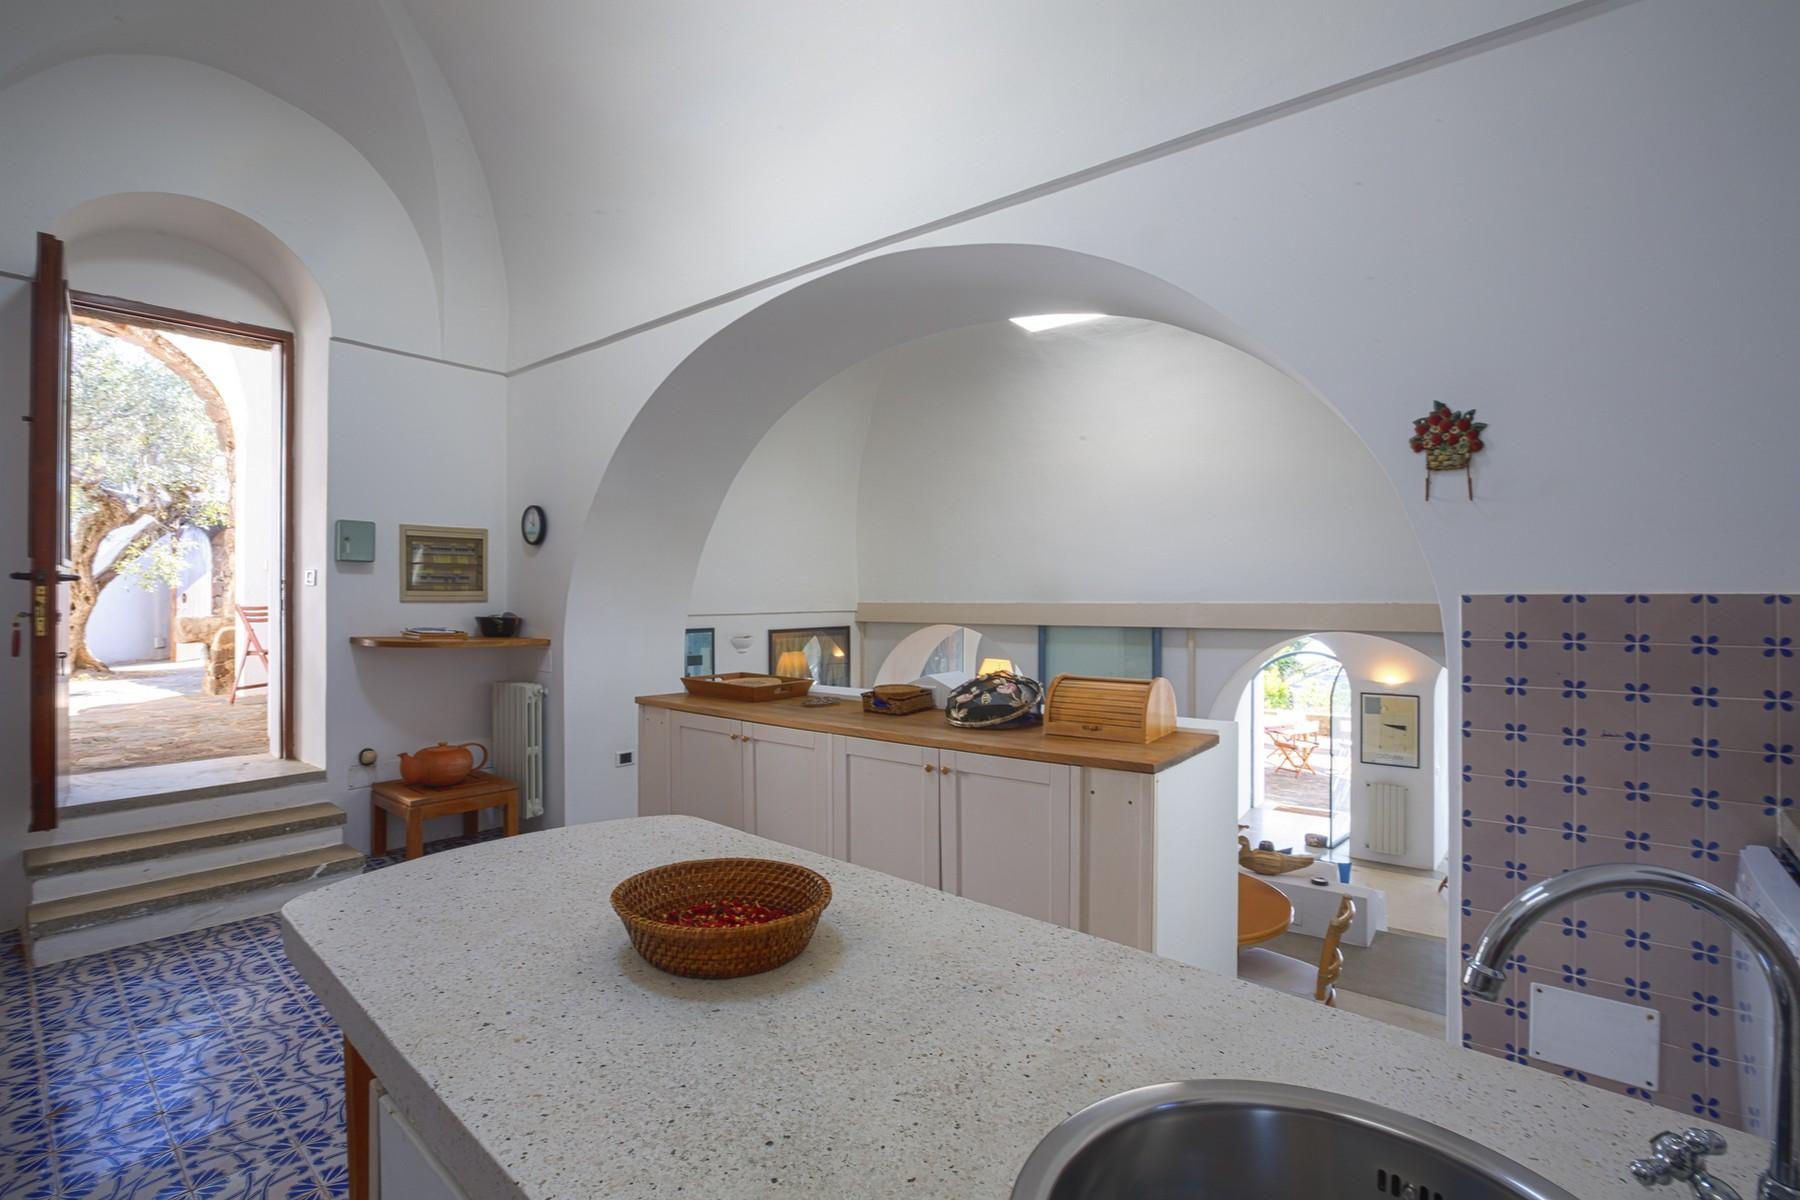 Villa in Vendita a Pantelleria: 5 locali, 530 mq - Foto 14